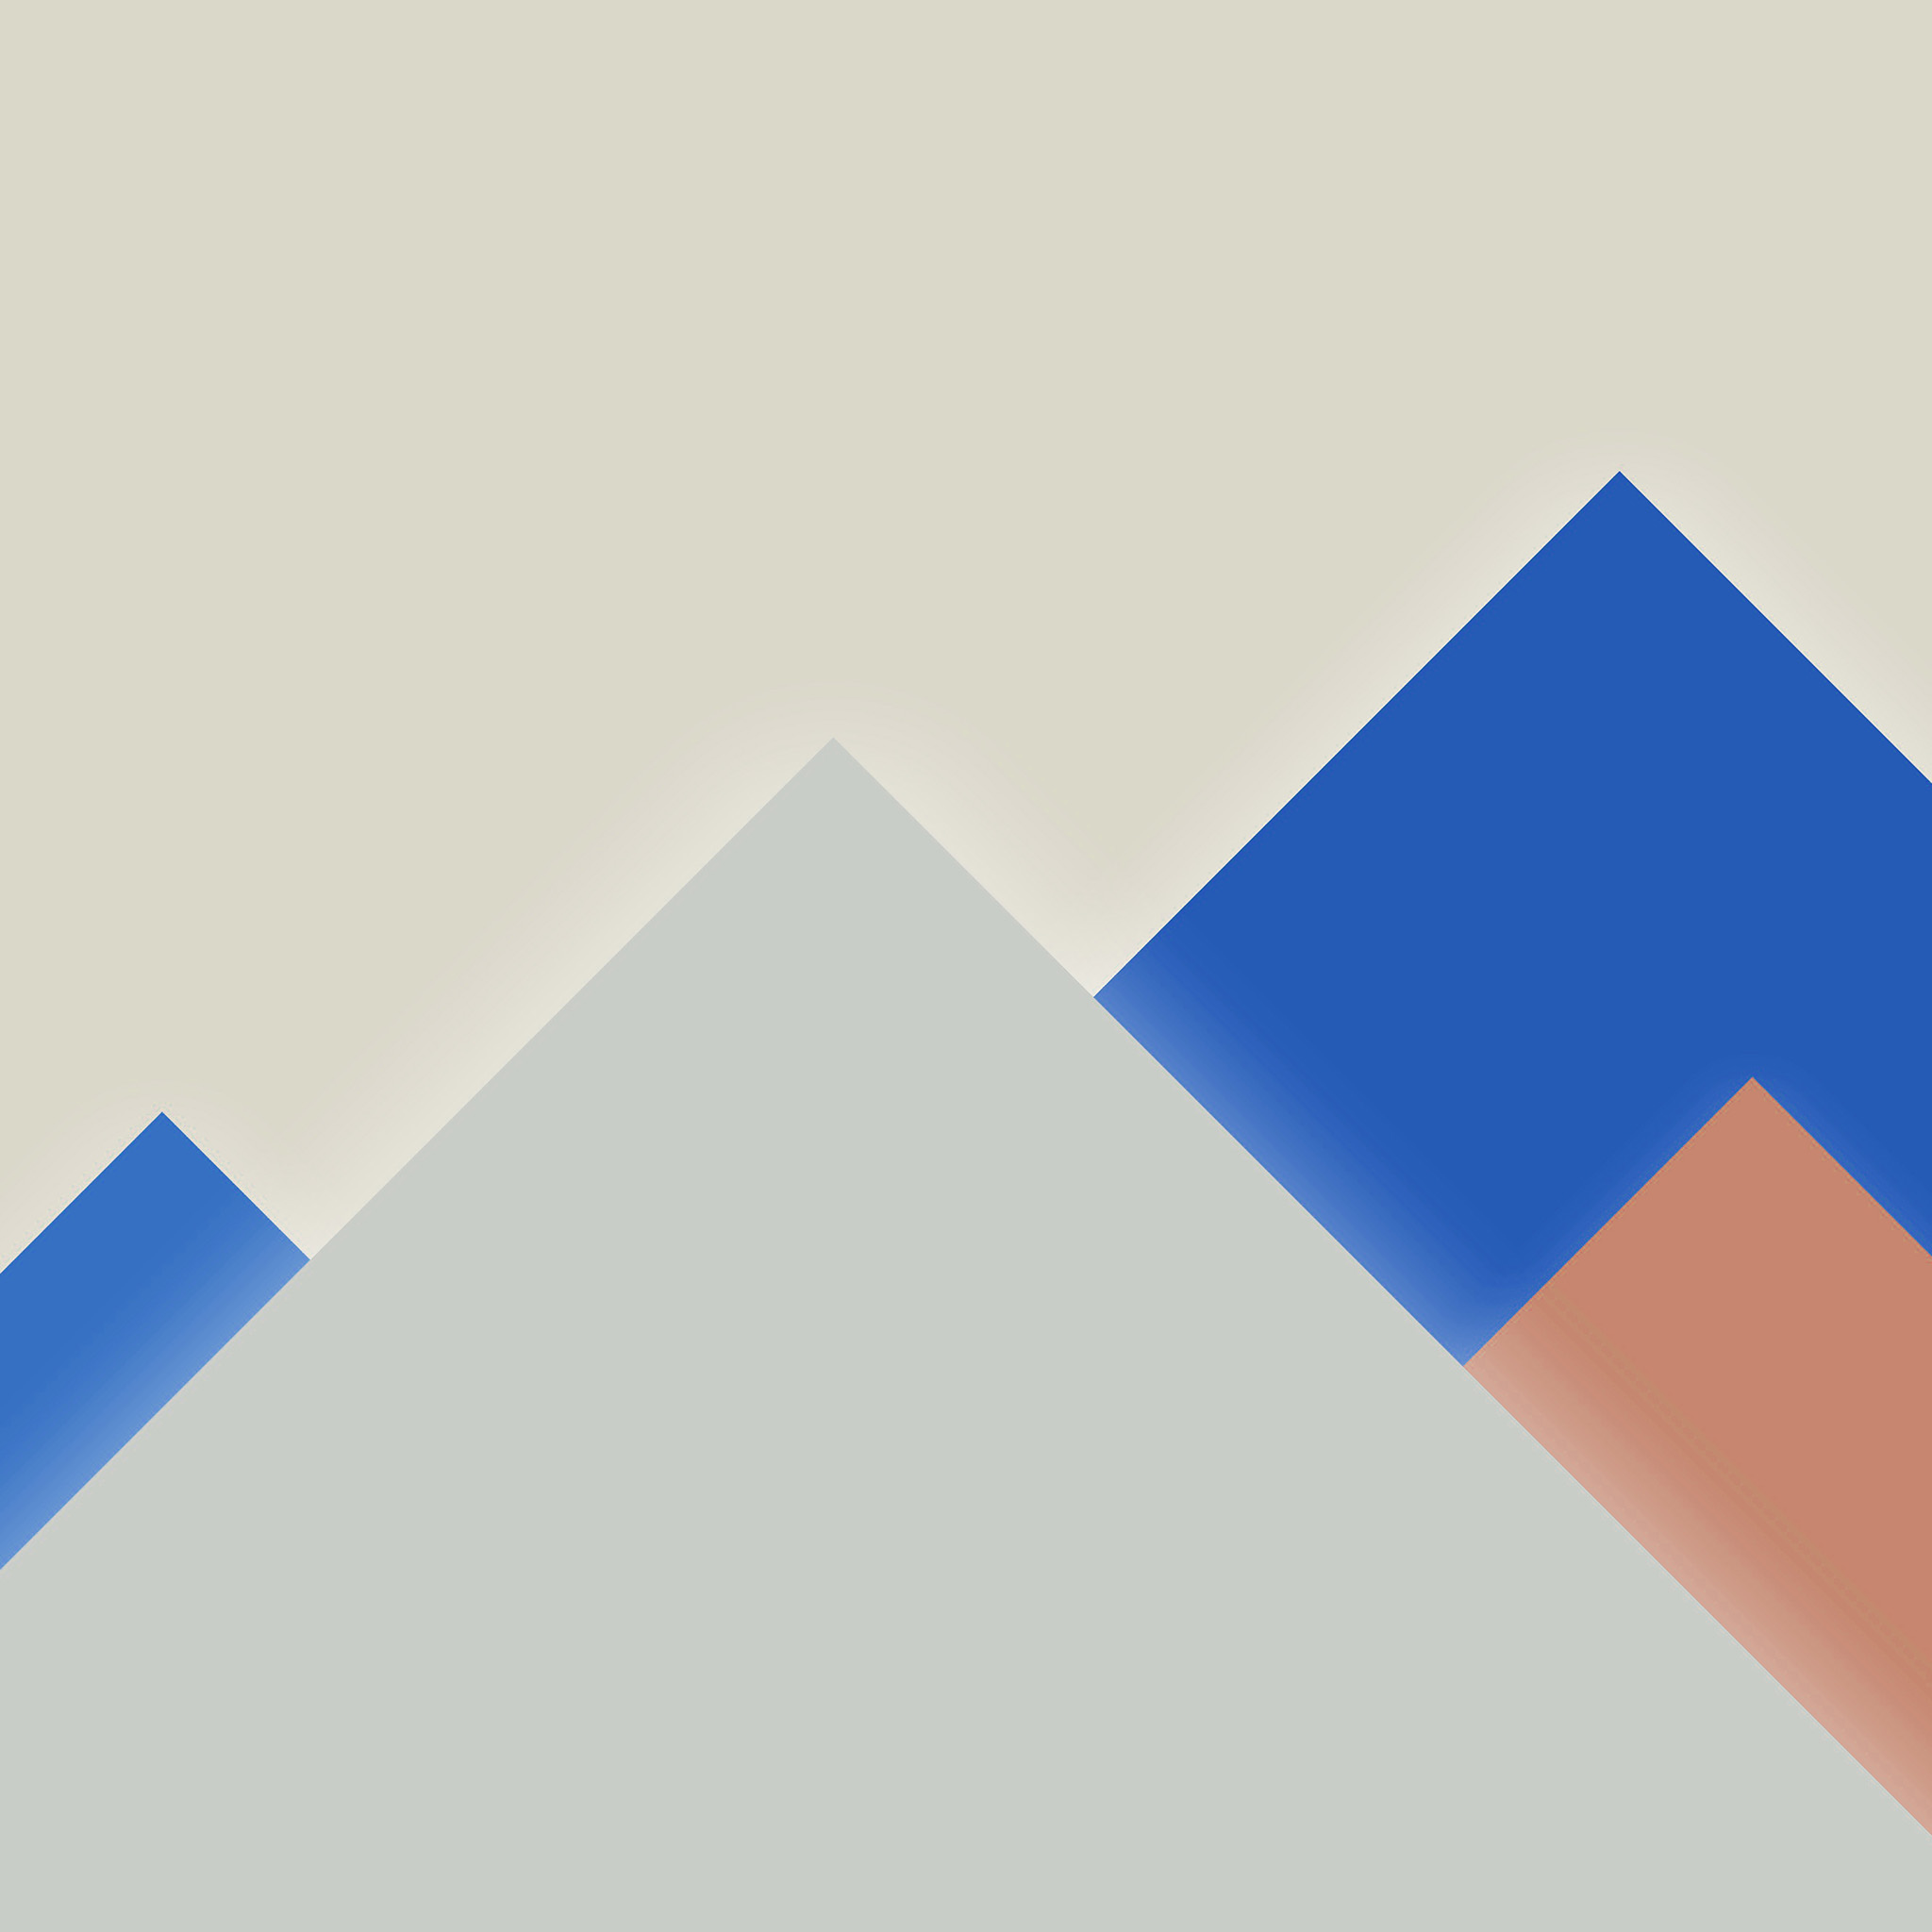 material design wallpaper blue - photo #7